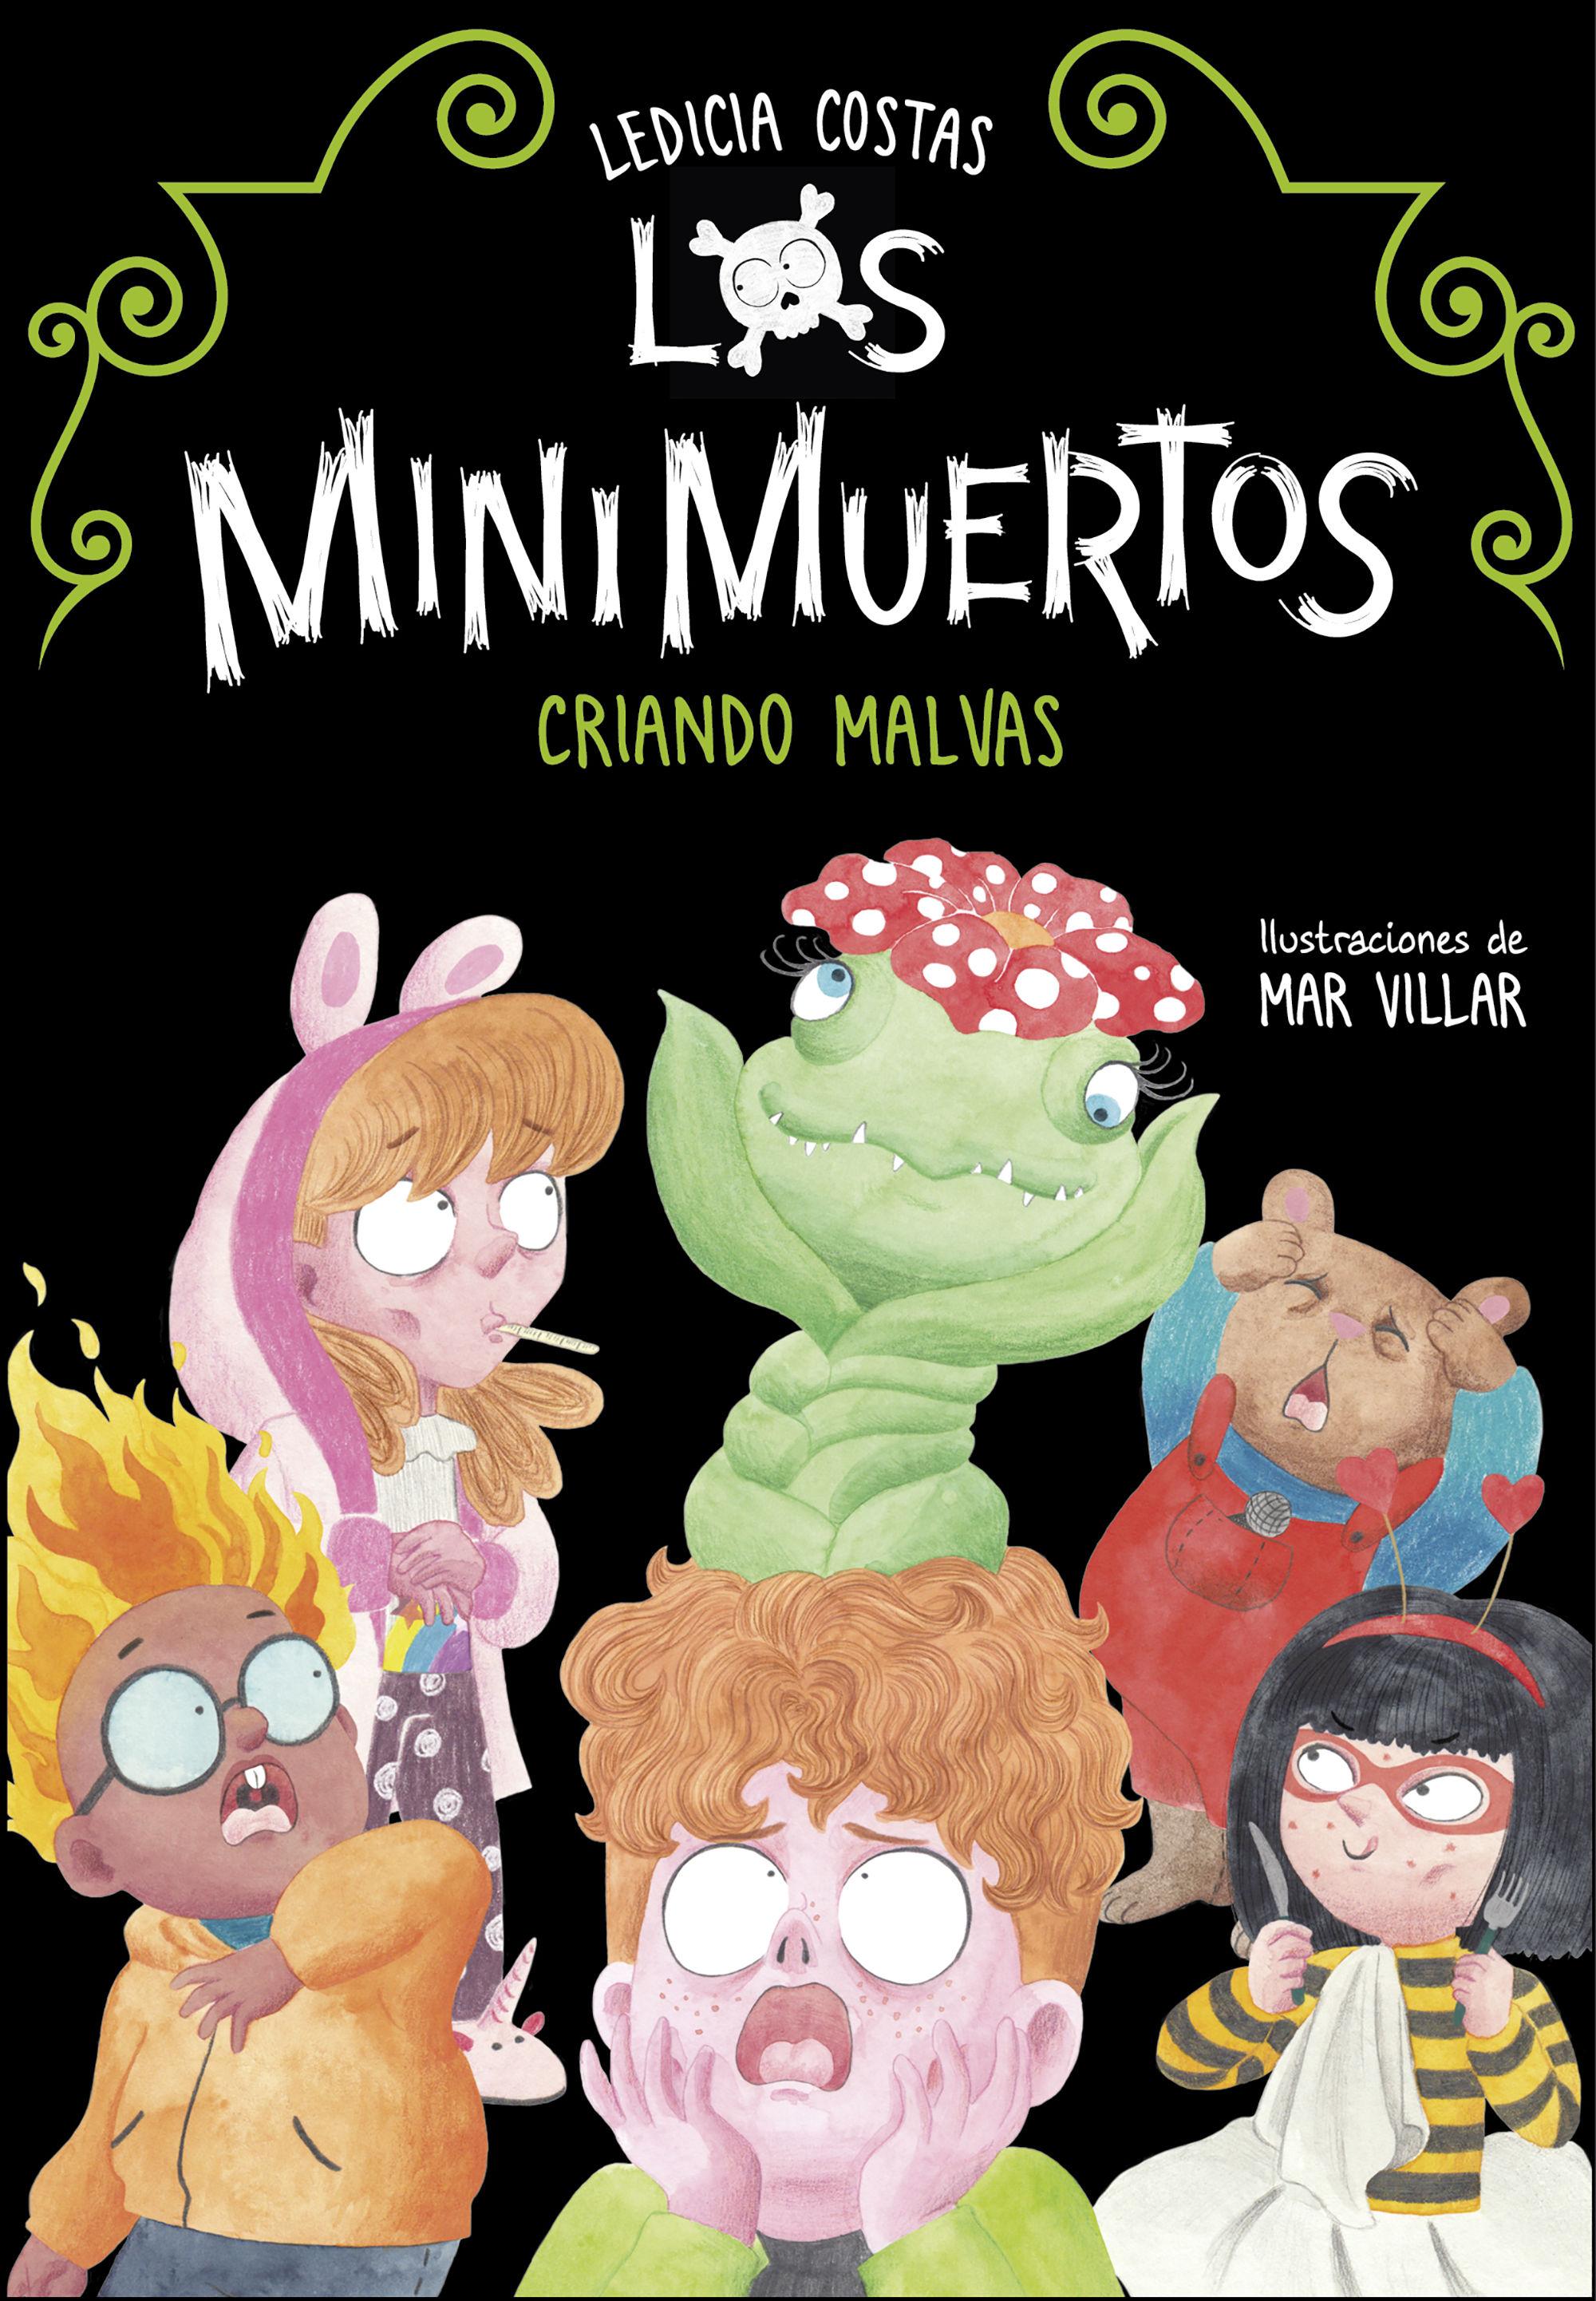 MINIMUERTOS 2 CRIANDO MALVAS